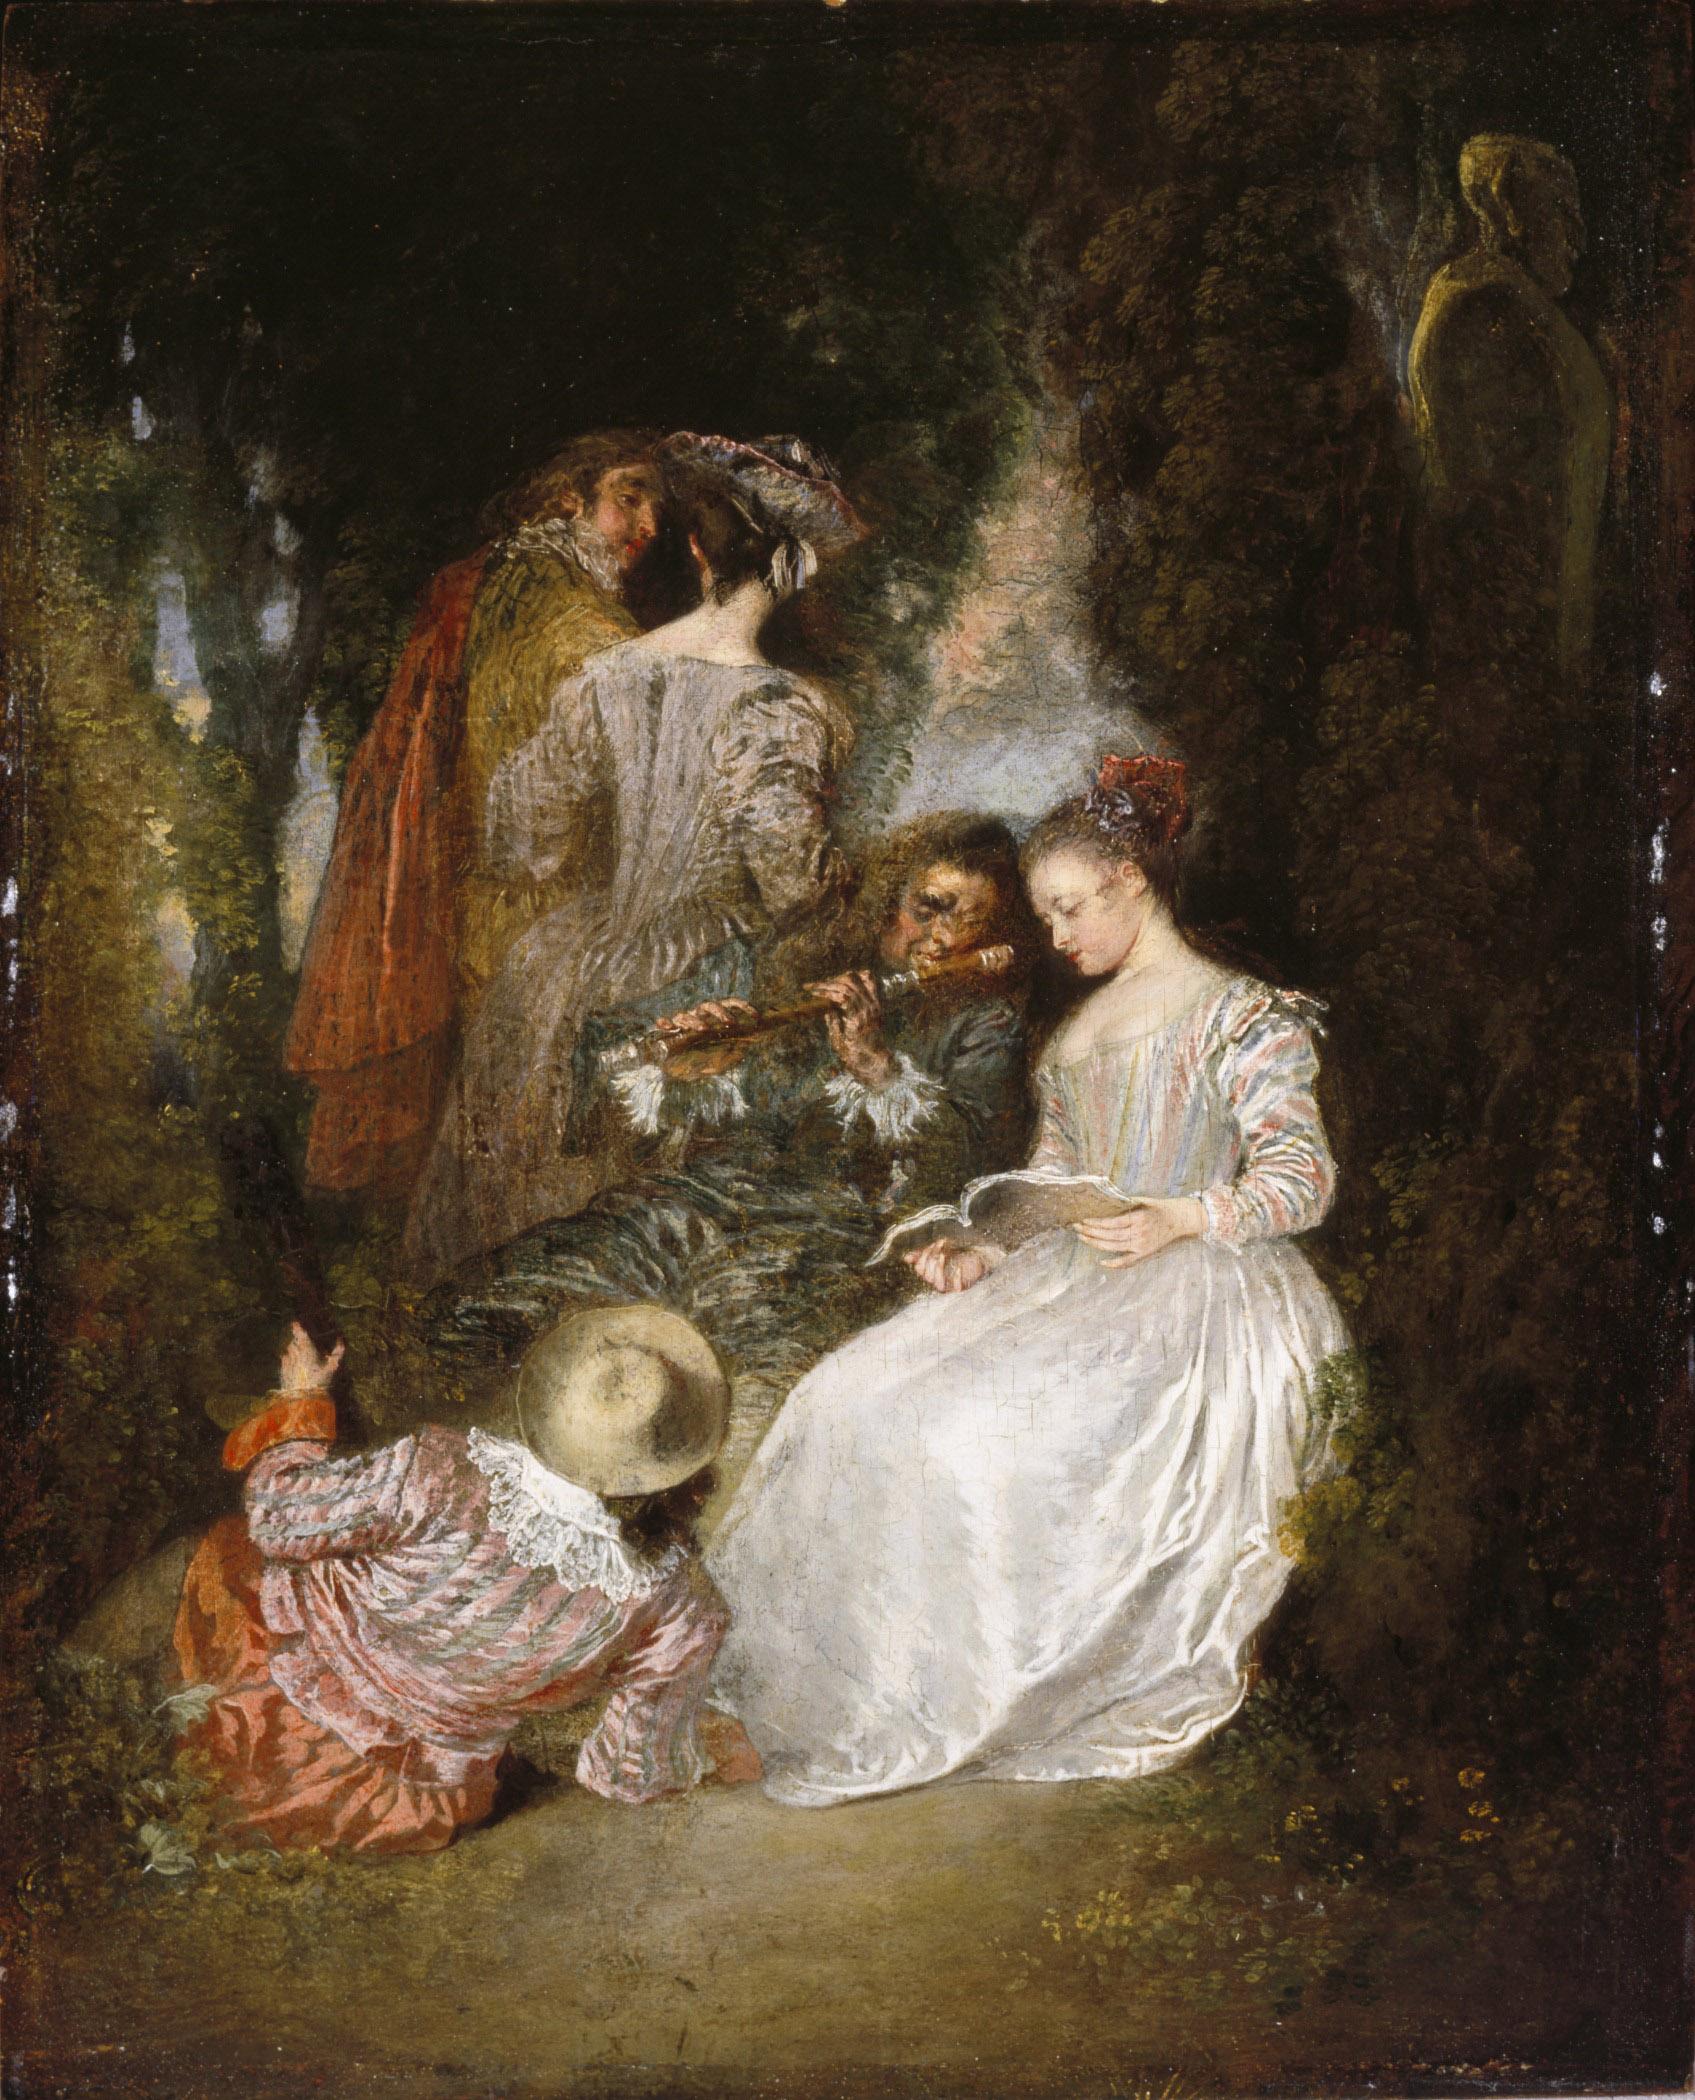 Watteau-1718-L-accord-parfait-Los-Angeles-California-Los-Angeles-County-Museum-of-Art